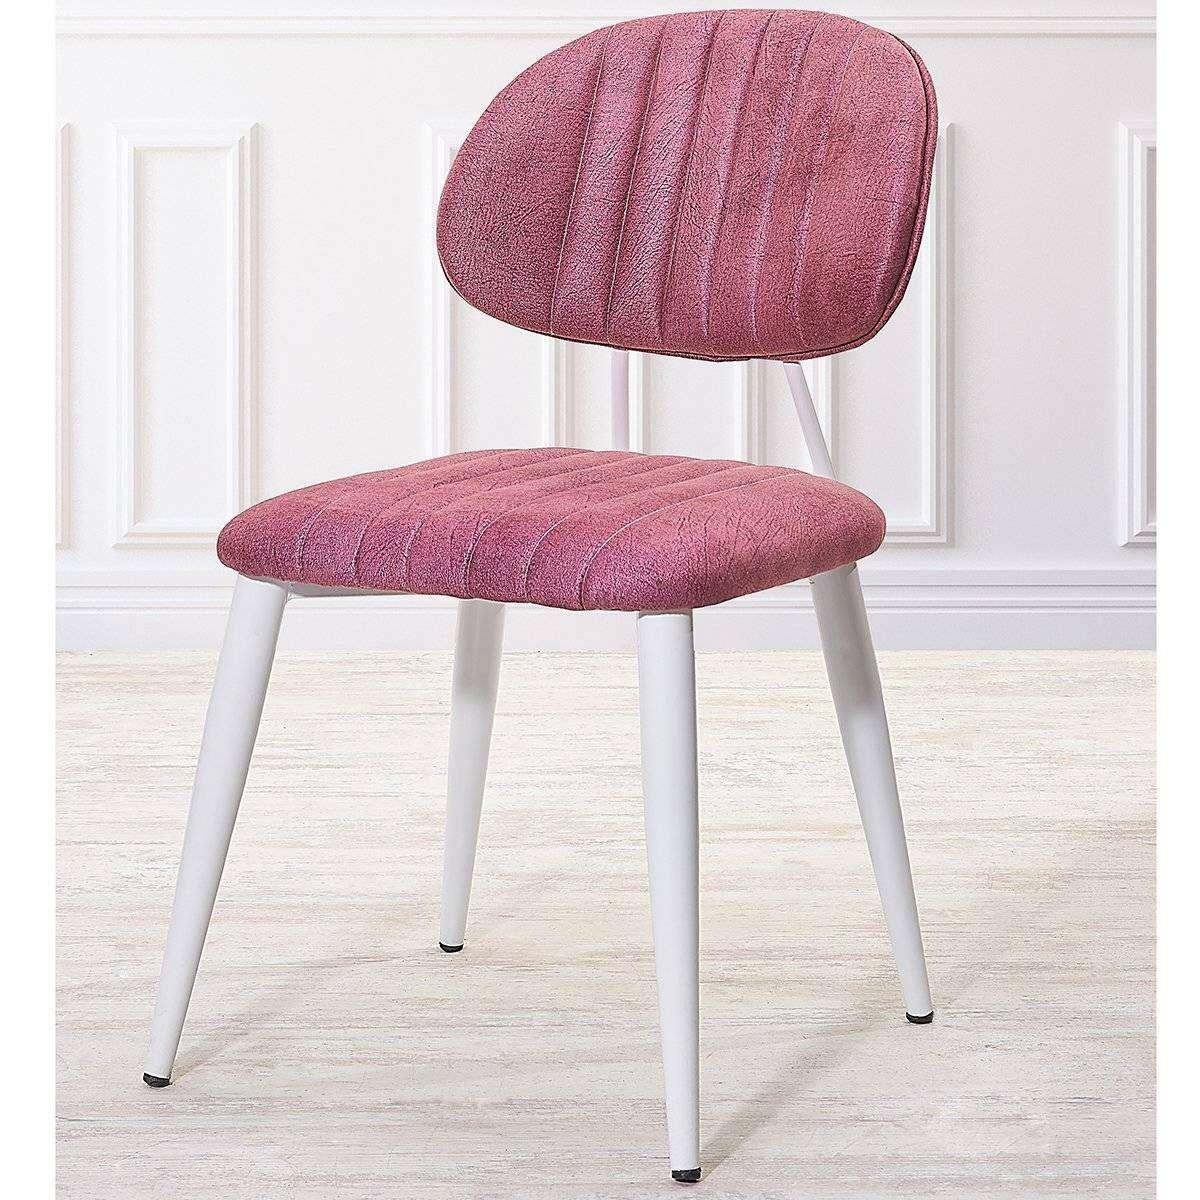 Kiremit Sandalye